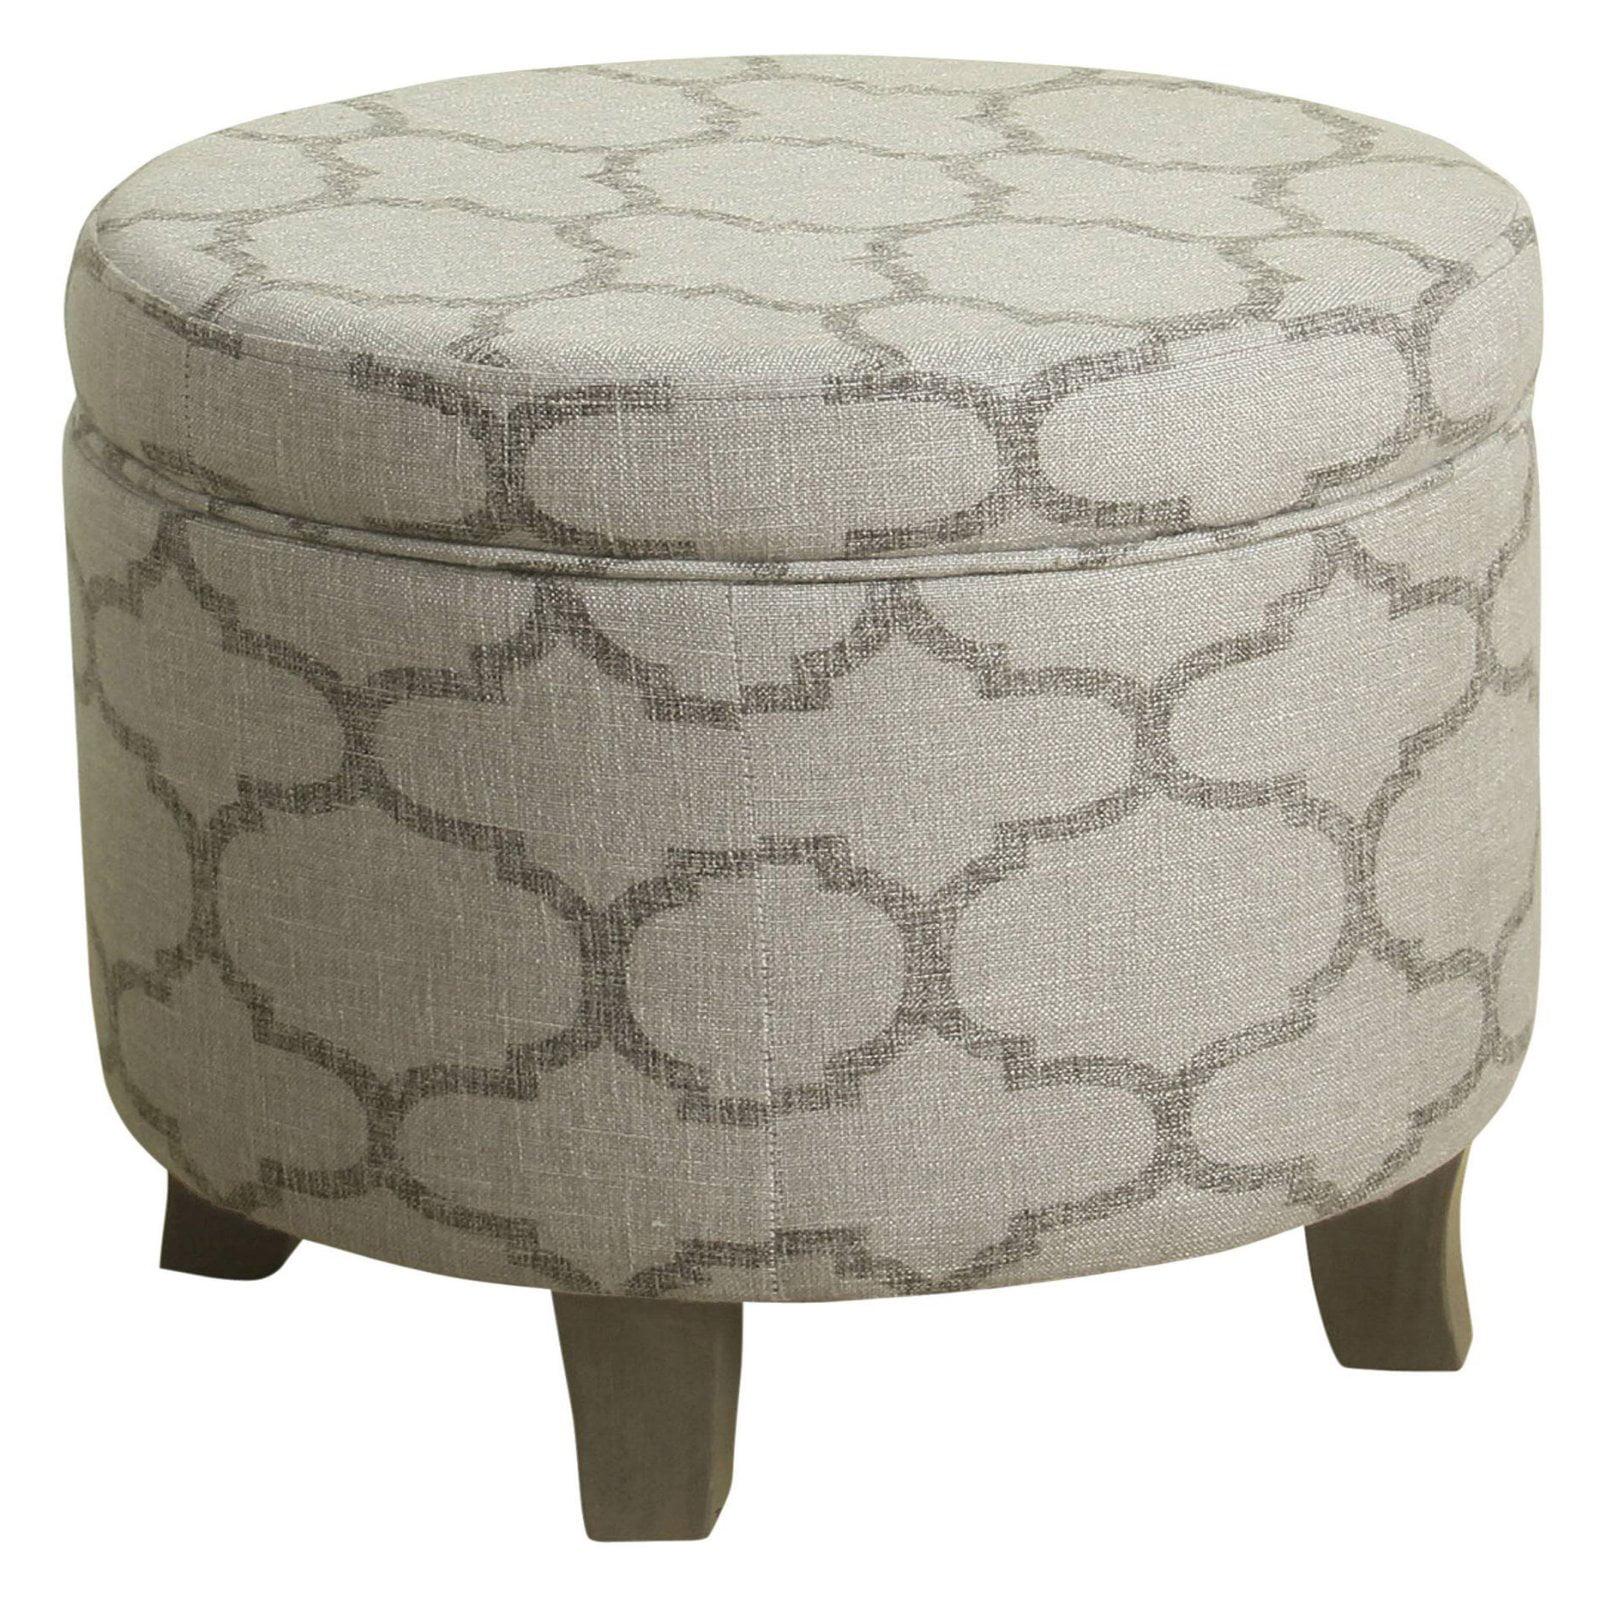 HomePop Cole Classics Round Storage Ottoman - Gray